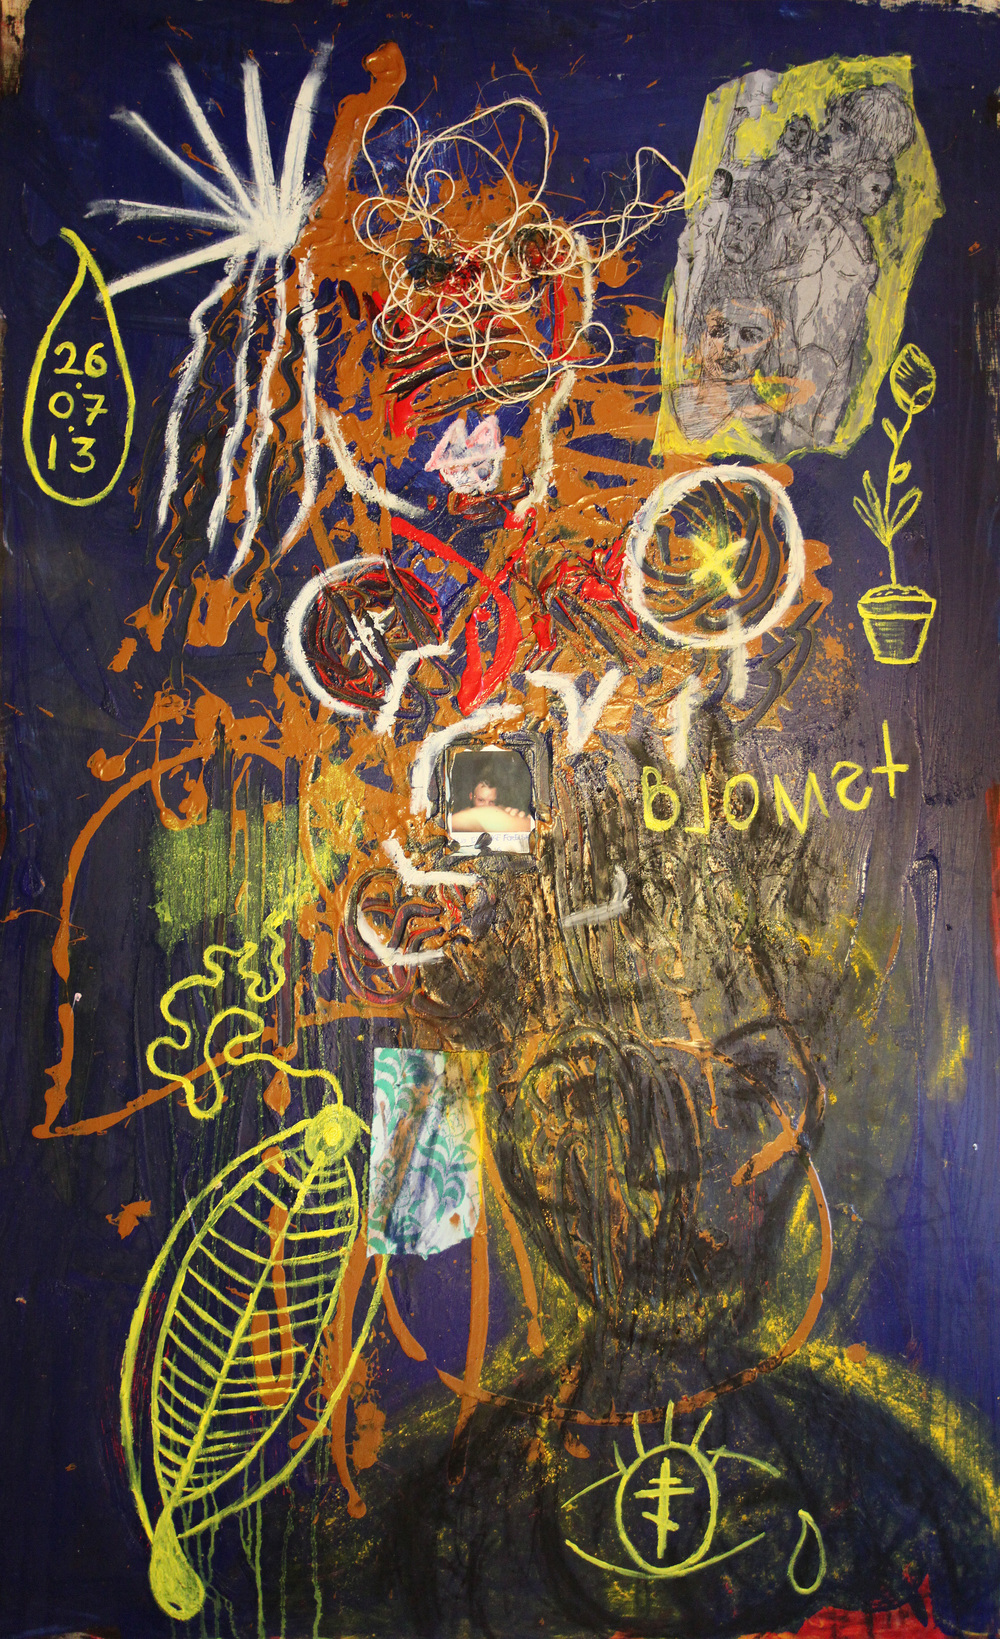 Shut Down  Mixed media on wood 160 x 100 cm 2013